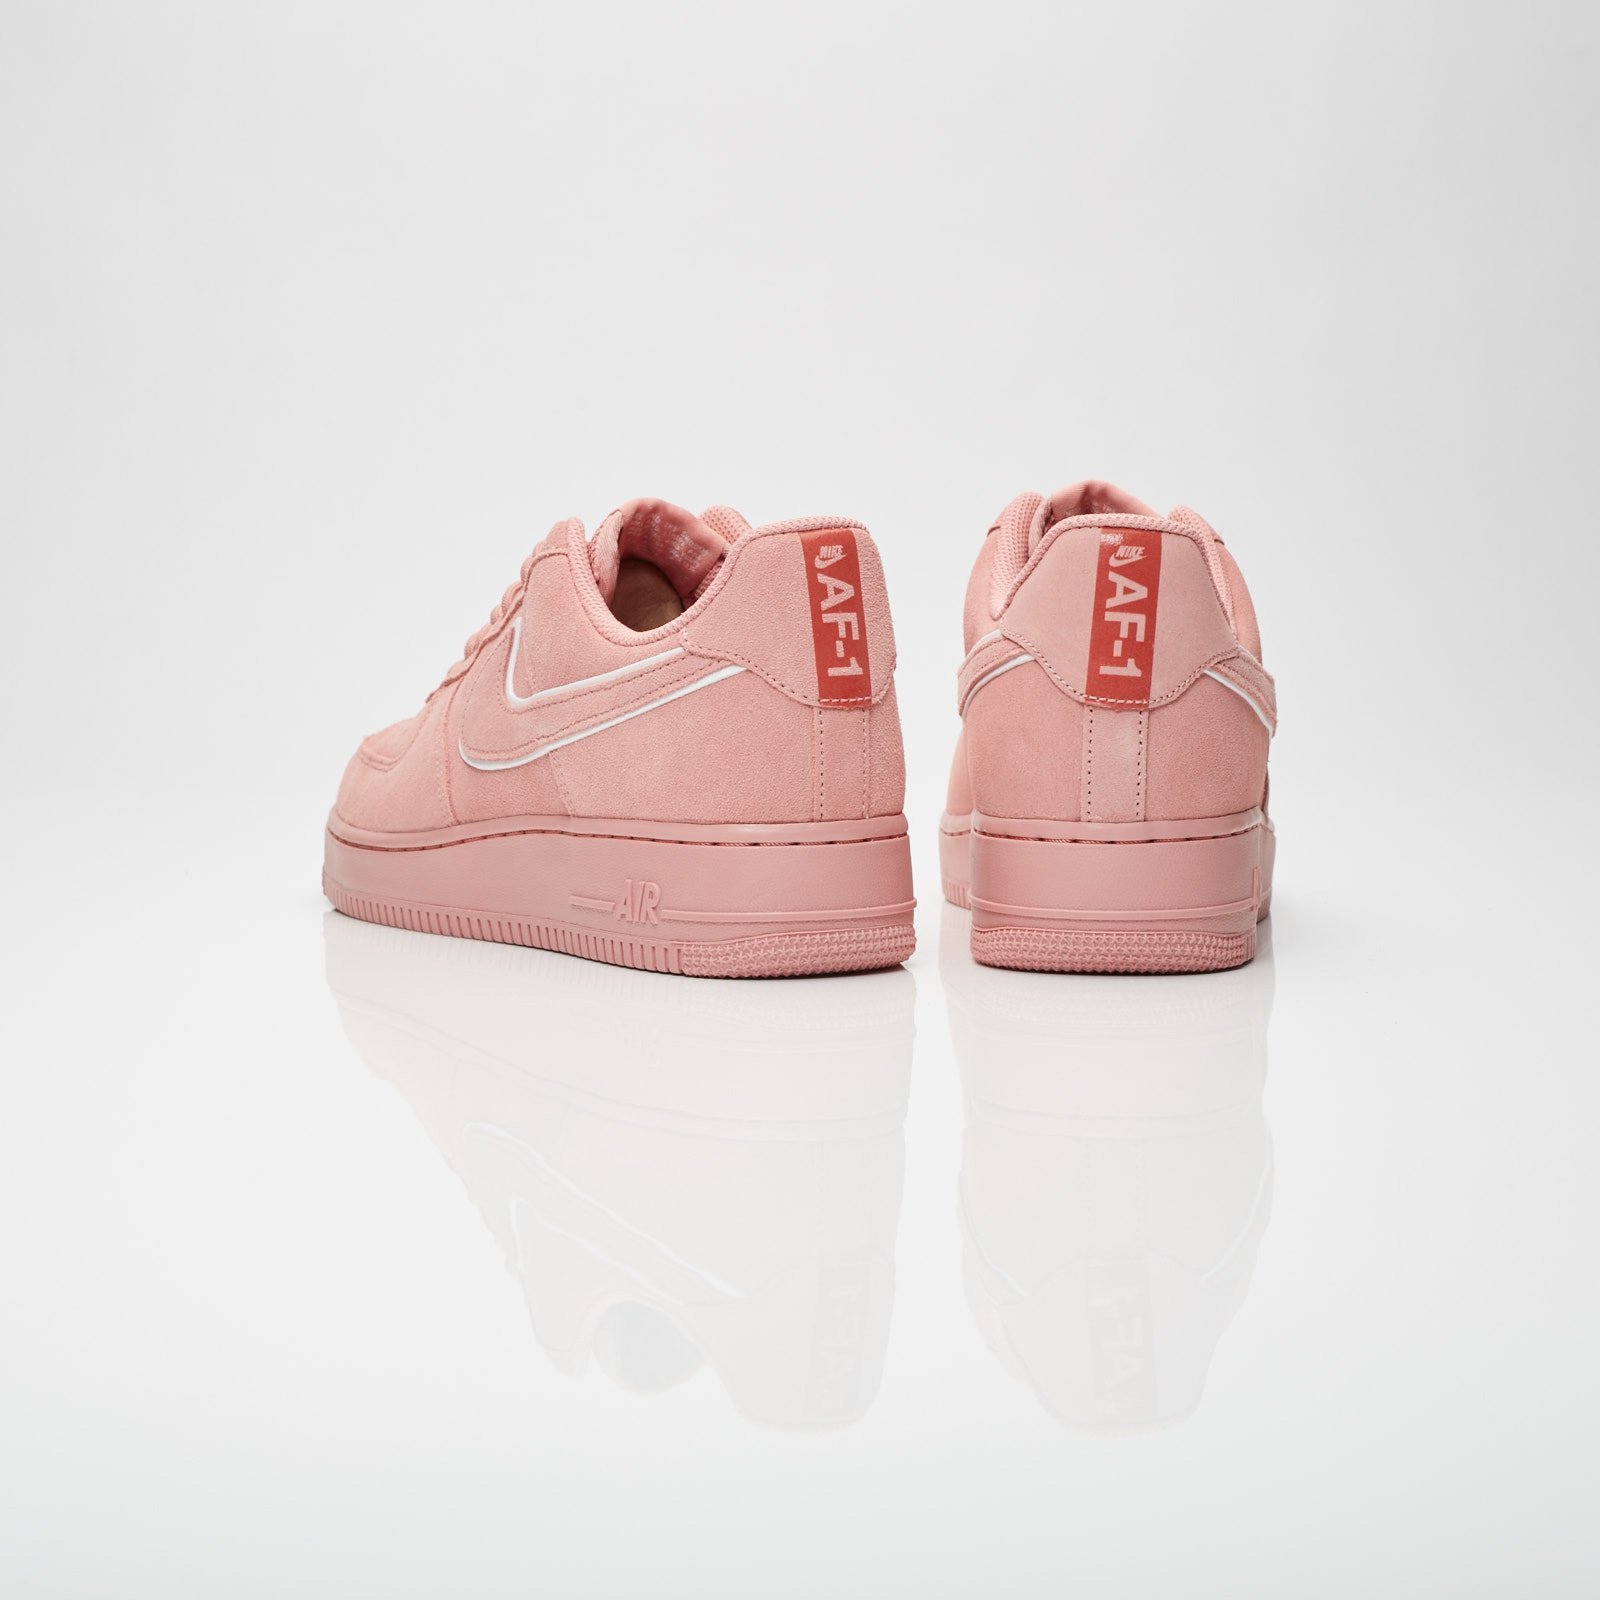 Nike Air Force 1 07 lv8 Suede - Aa1117-601 - Sneakersnstuff ... d28fd963d